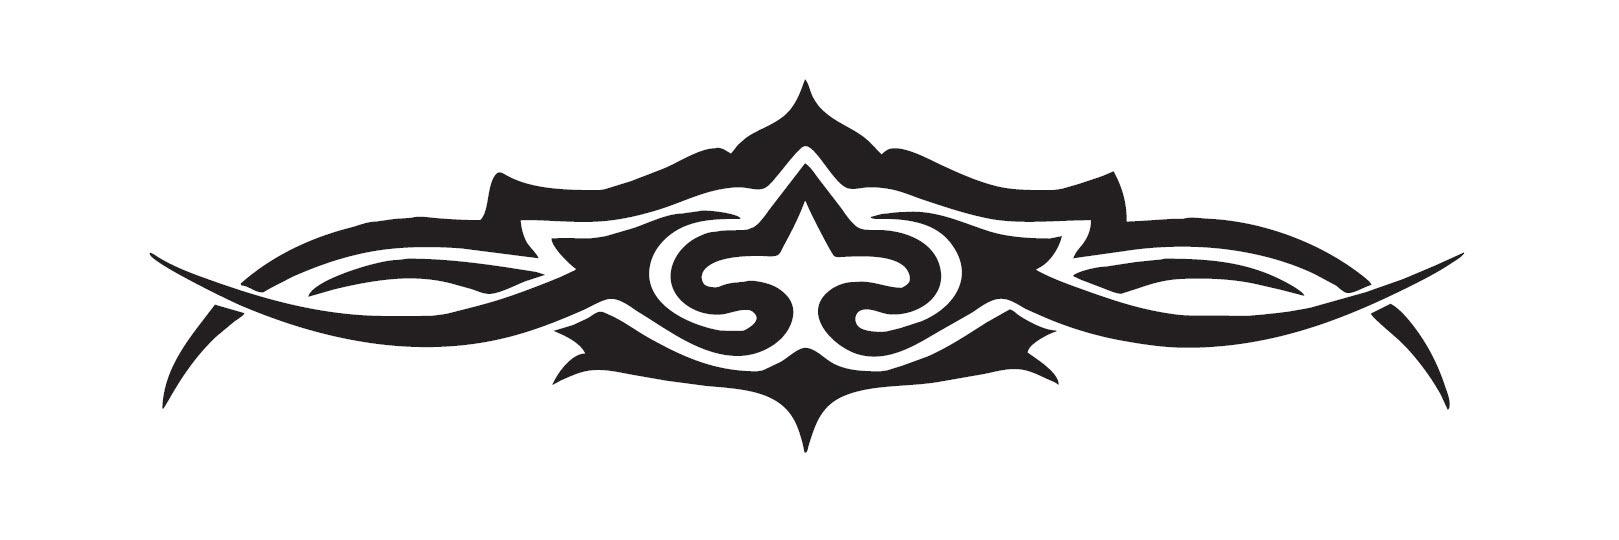 USA and International Orders: 2 x 100mm Hi Gloss Black Sticker. Classic Tattoo Design. Suitable for Bikes, Helmets etc. 000US2